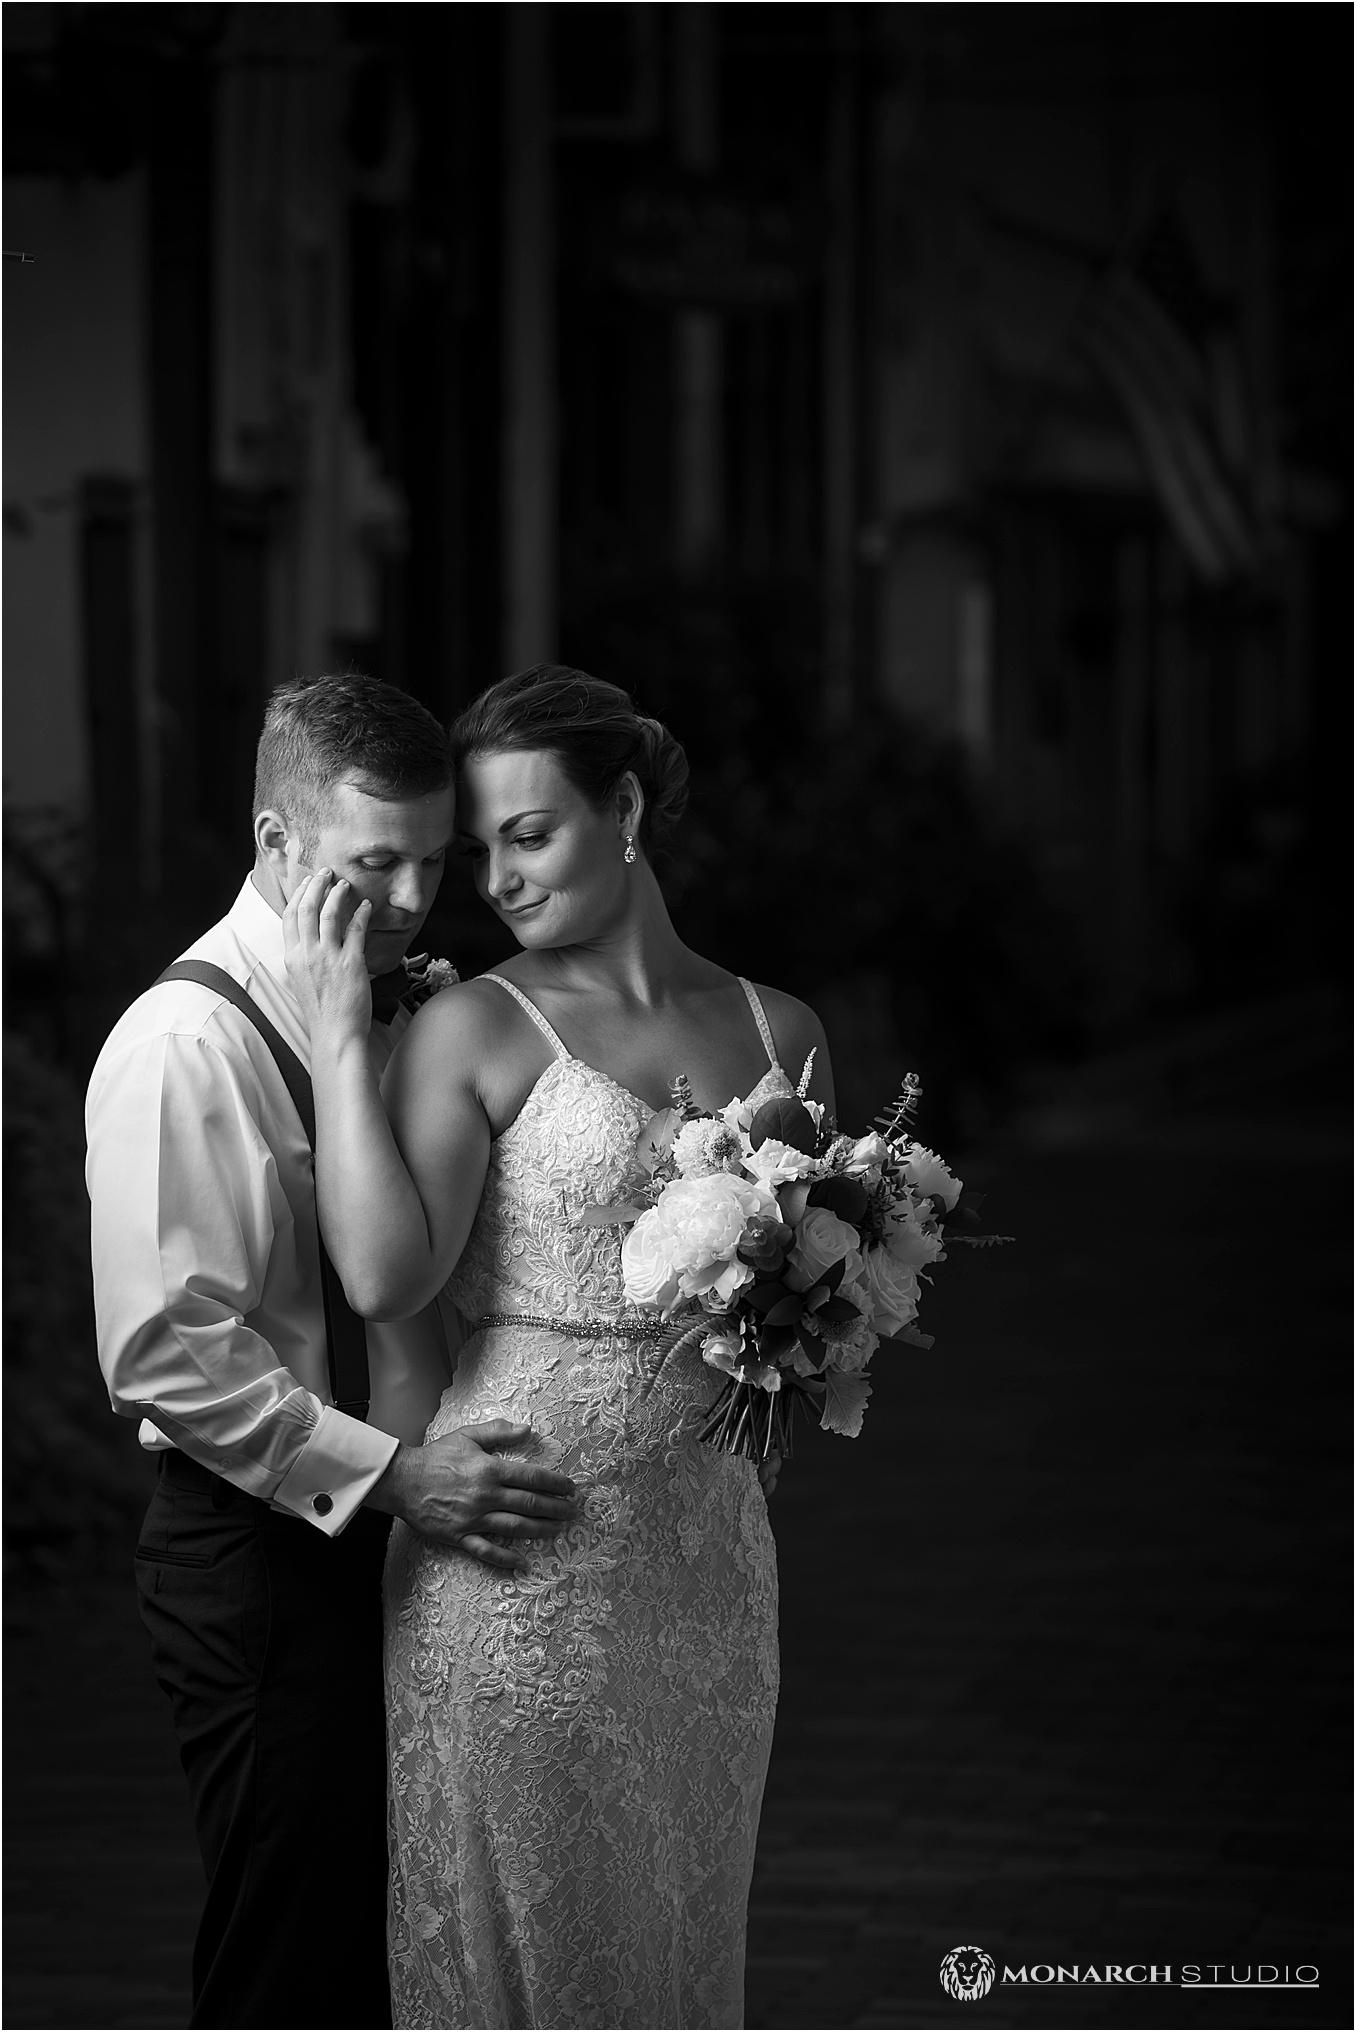 049-whiteroom-wedding-photographer-2019-05-22_0031.jpg